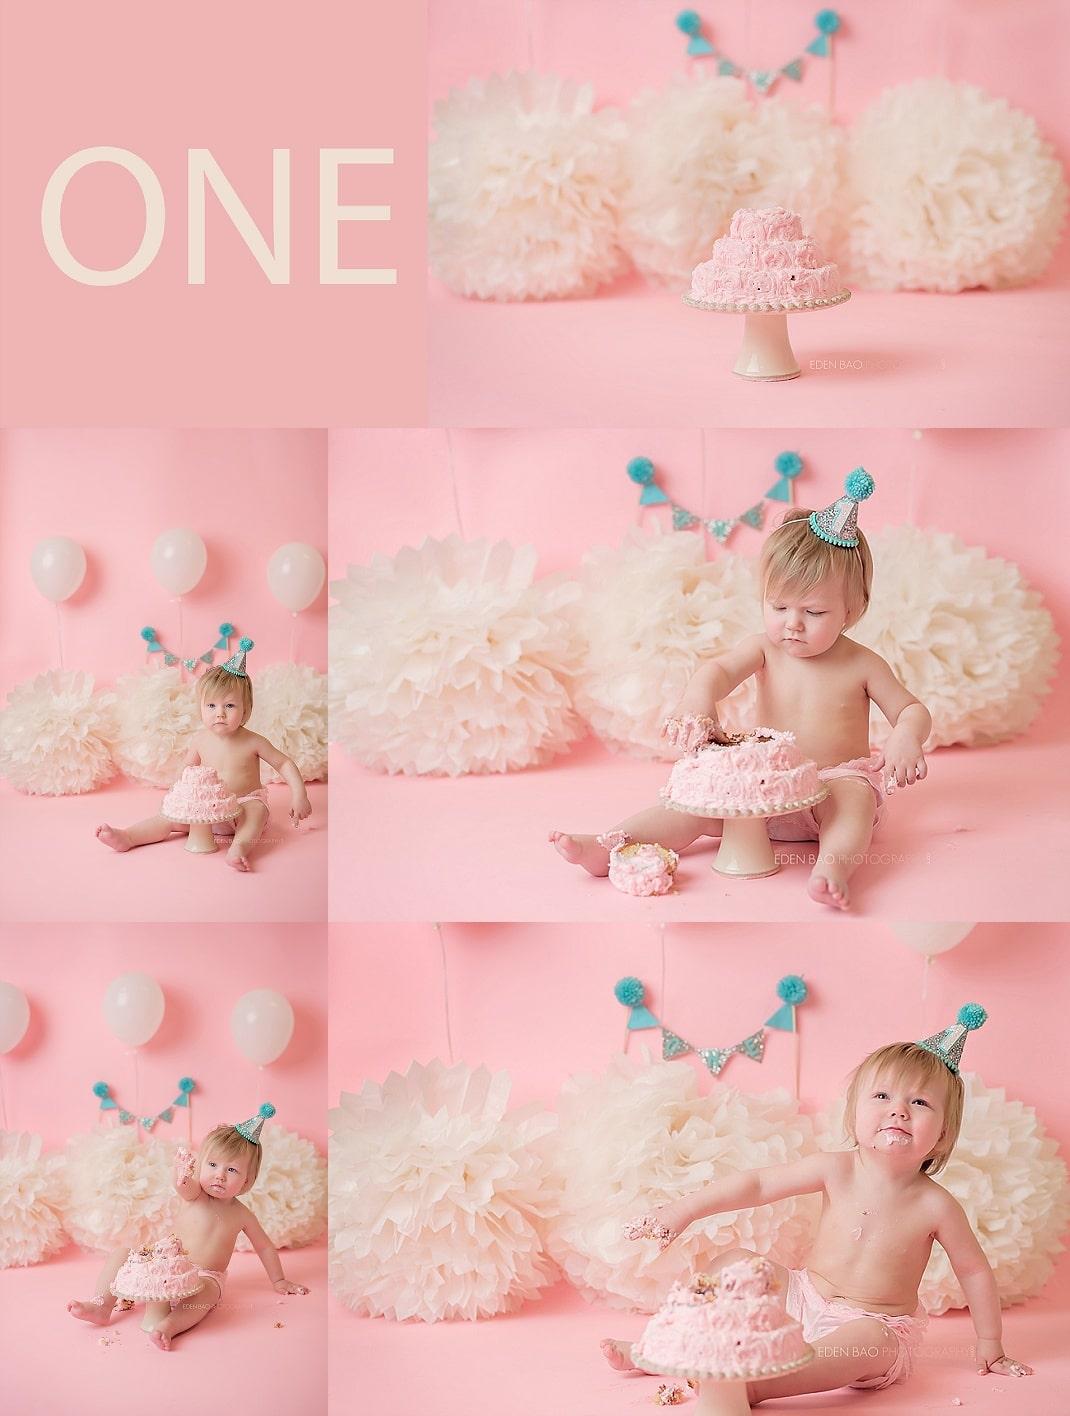 everett-cake-smash-photographer-baby-with-pink-cake